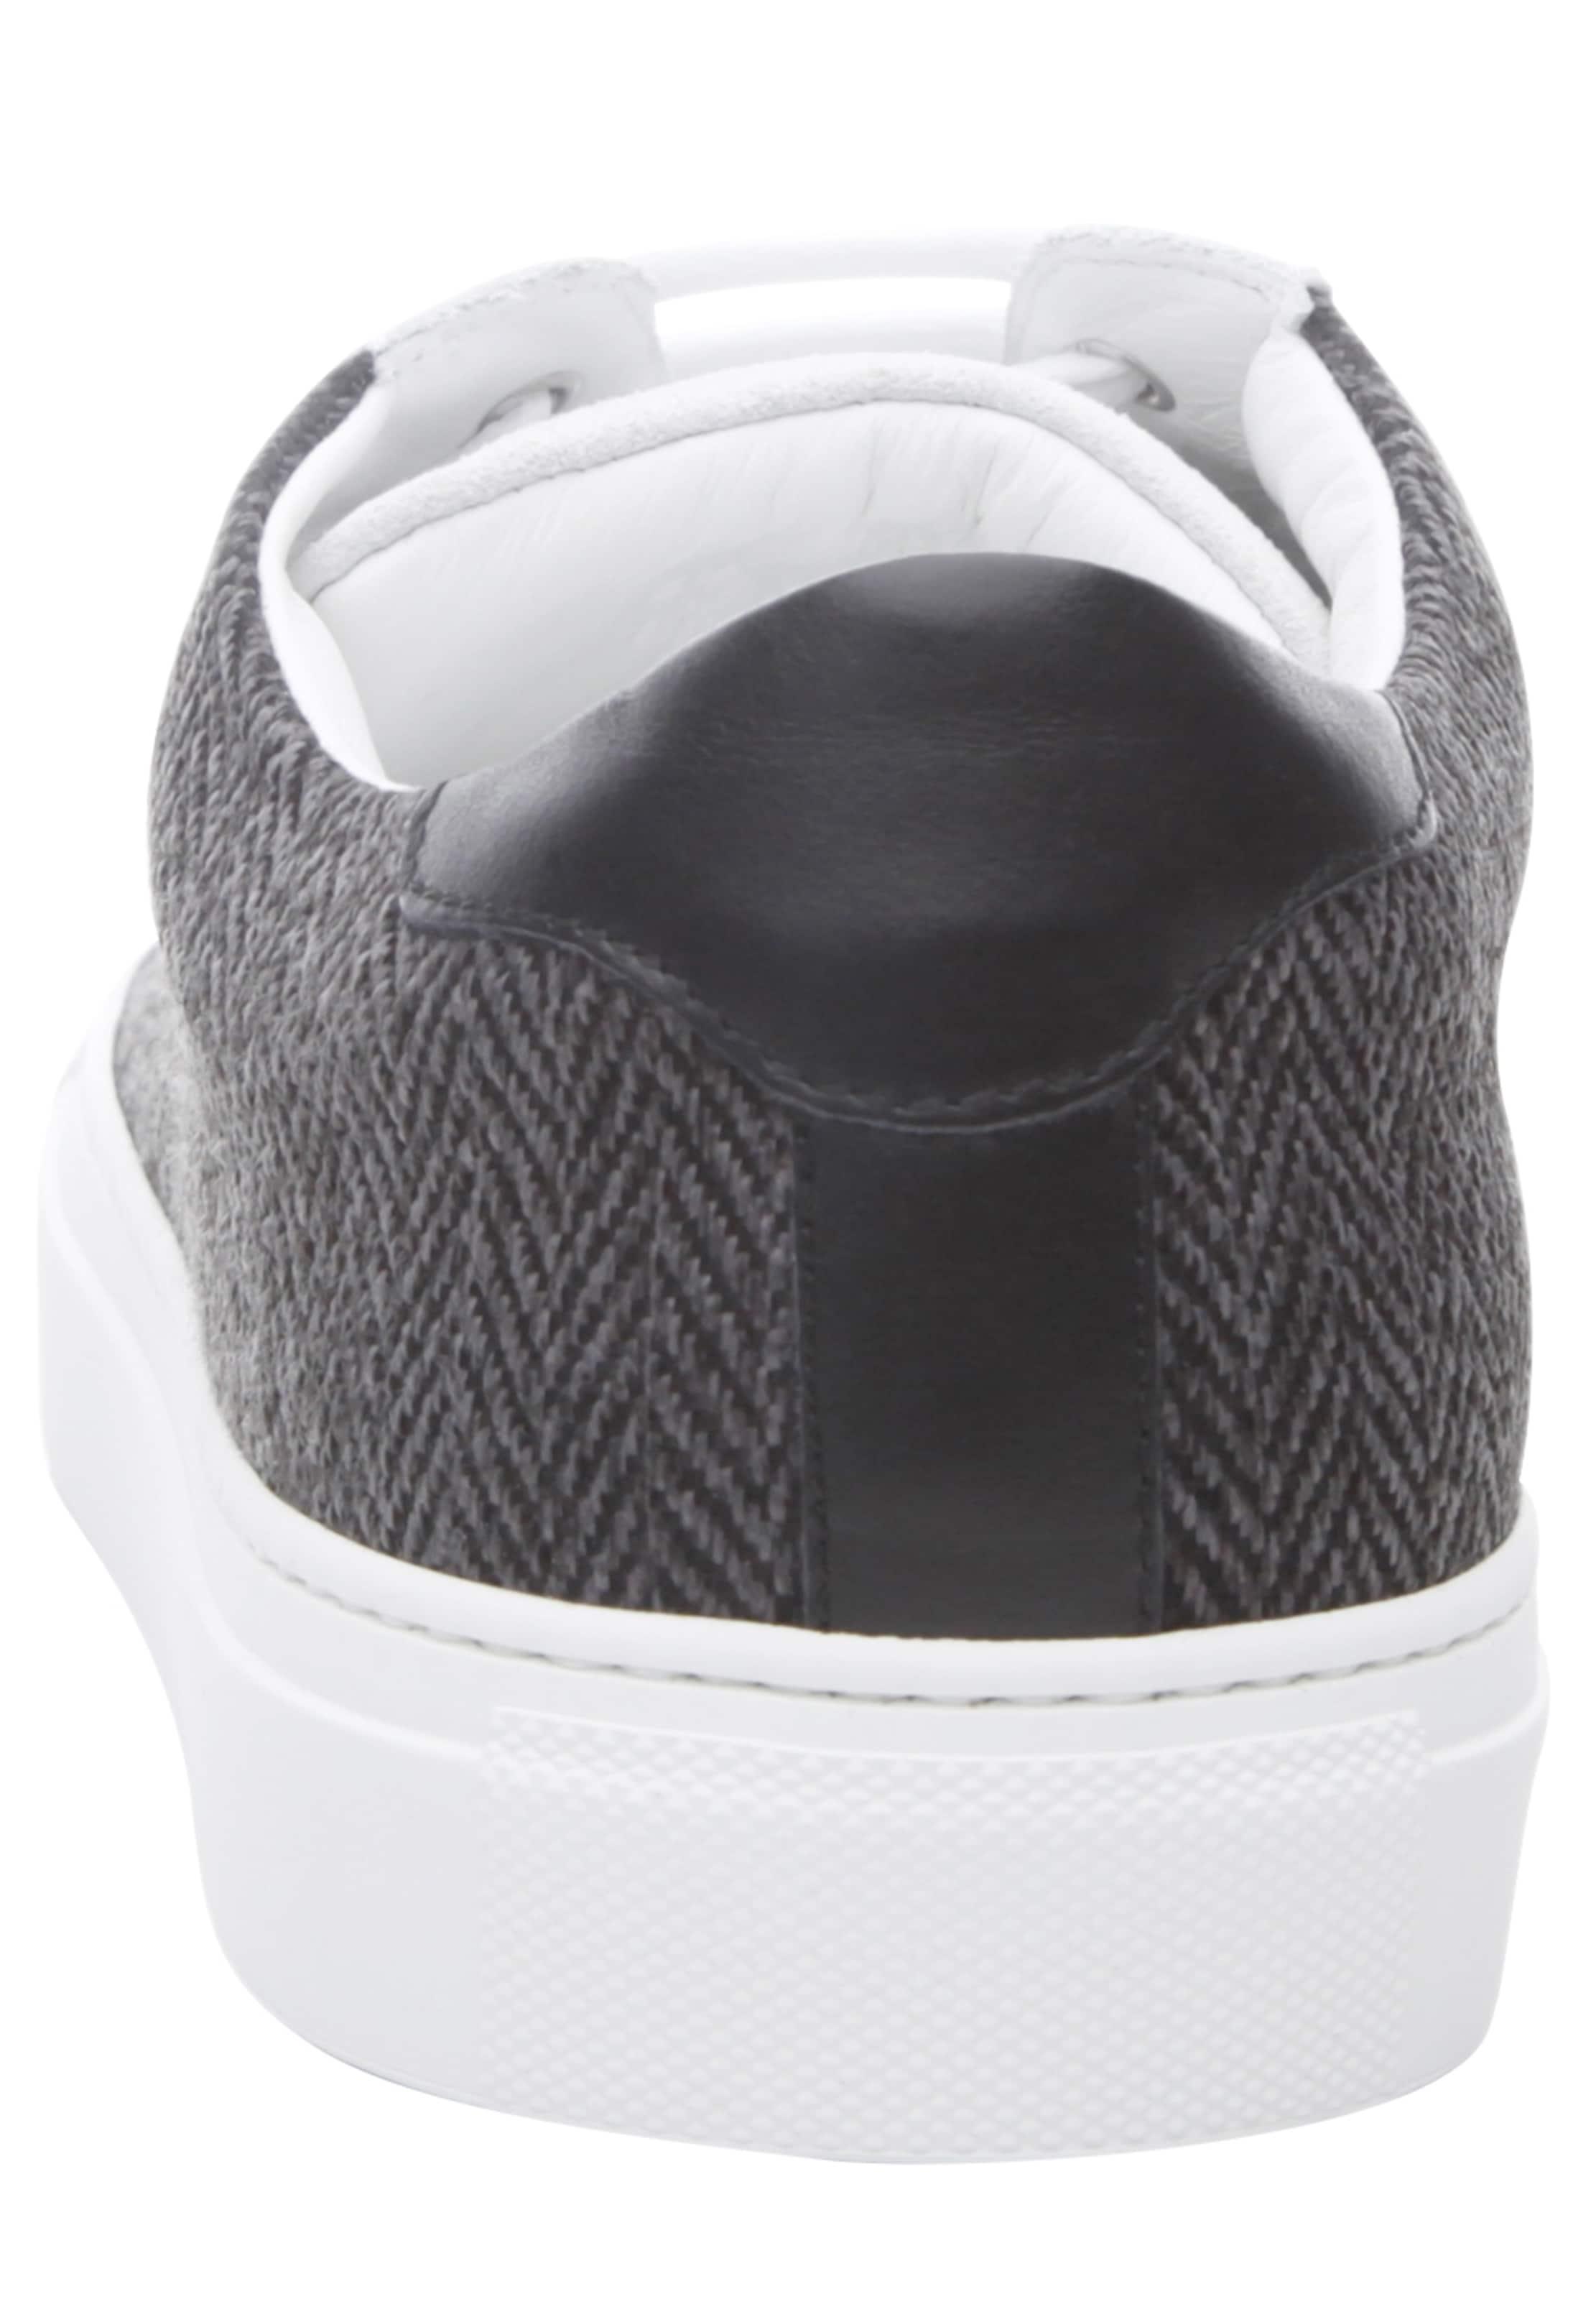 SchuhePASSION Turnschuhe 'No. 48 MS Leder, Textil Billige Billige Billige Herren- und Damenschuhe c34c8c